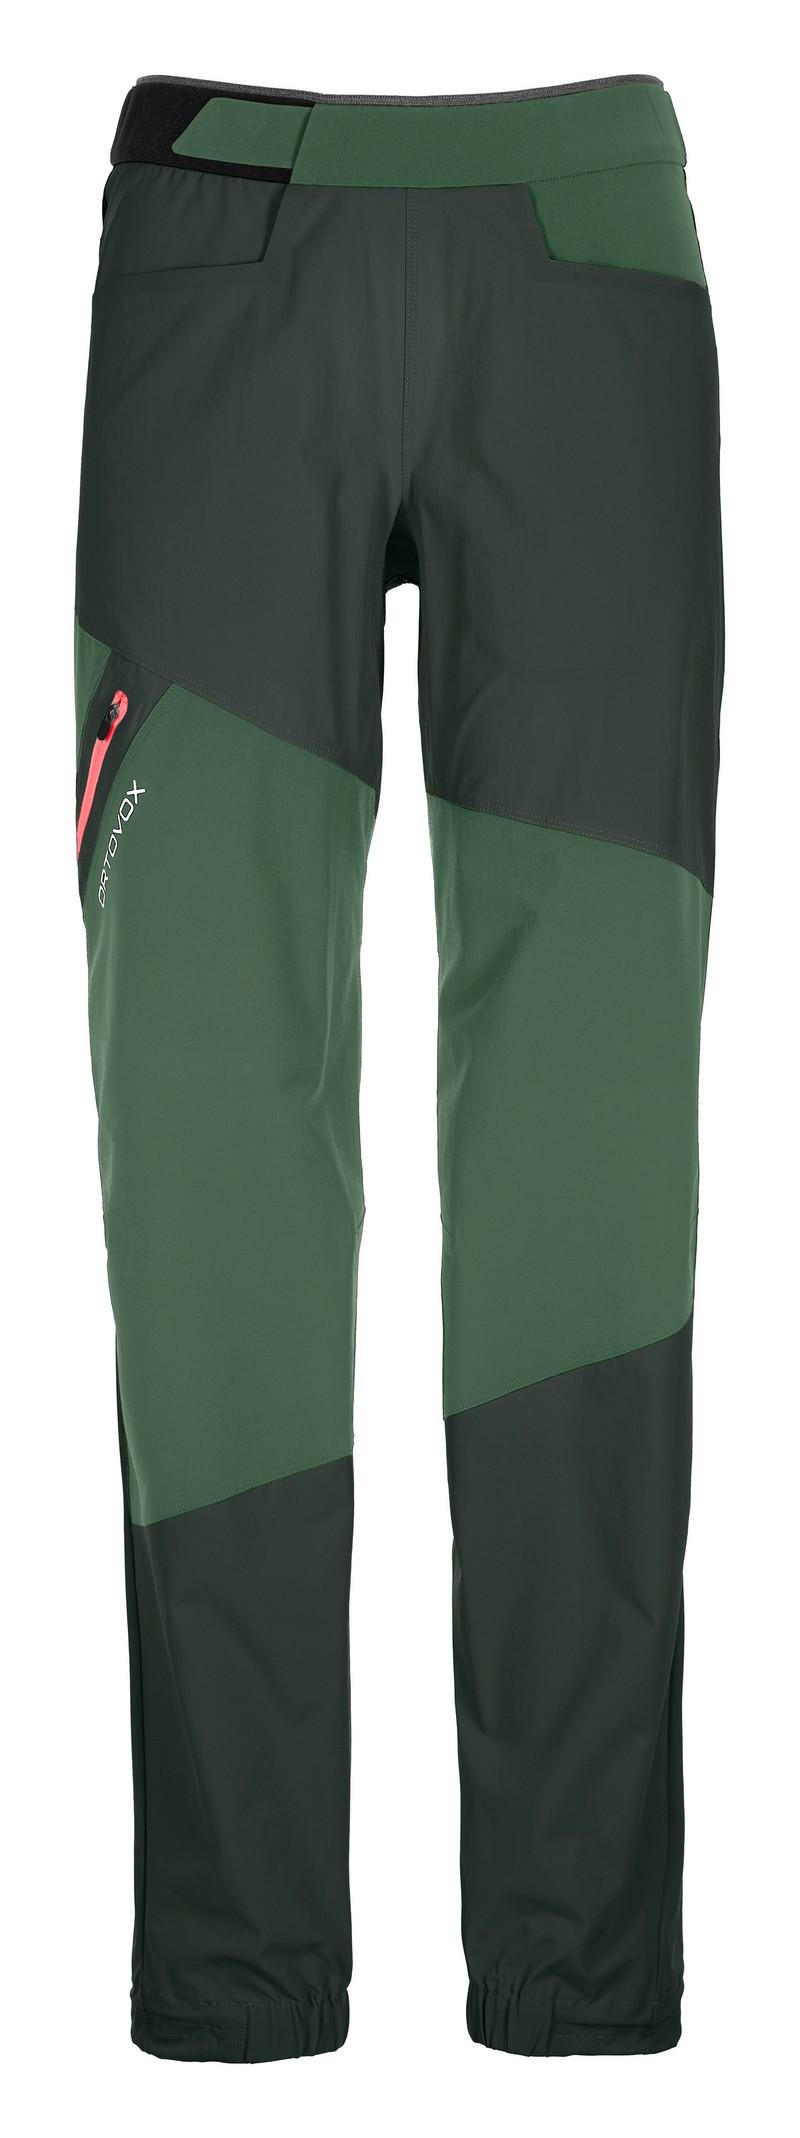 "Ortovox ""Vajolet Pants W"" - green pine"